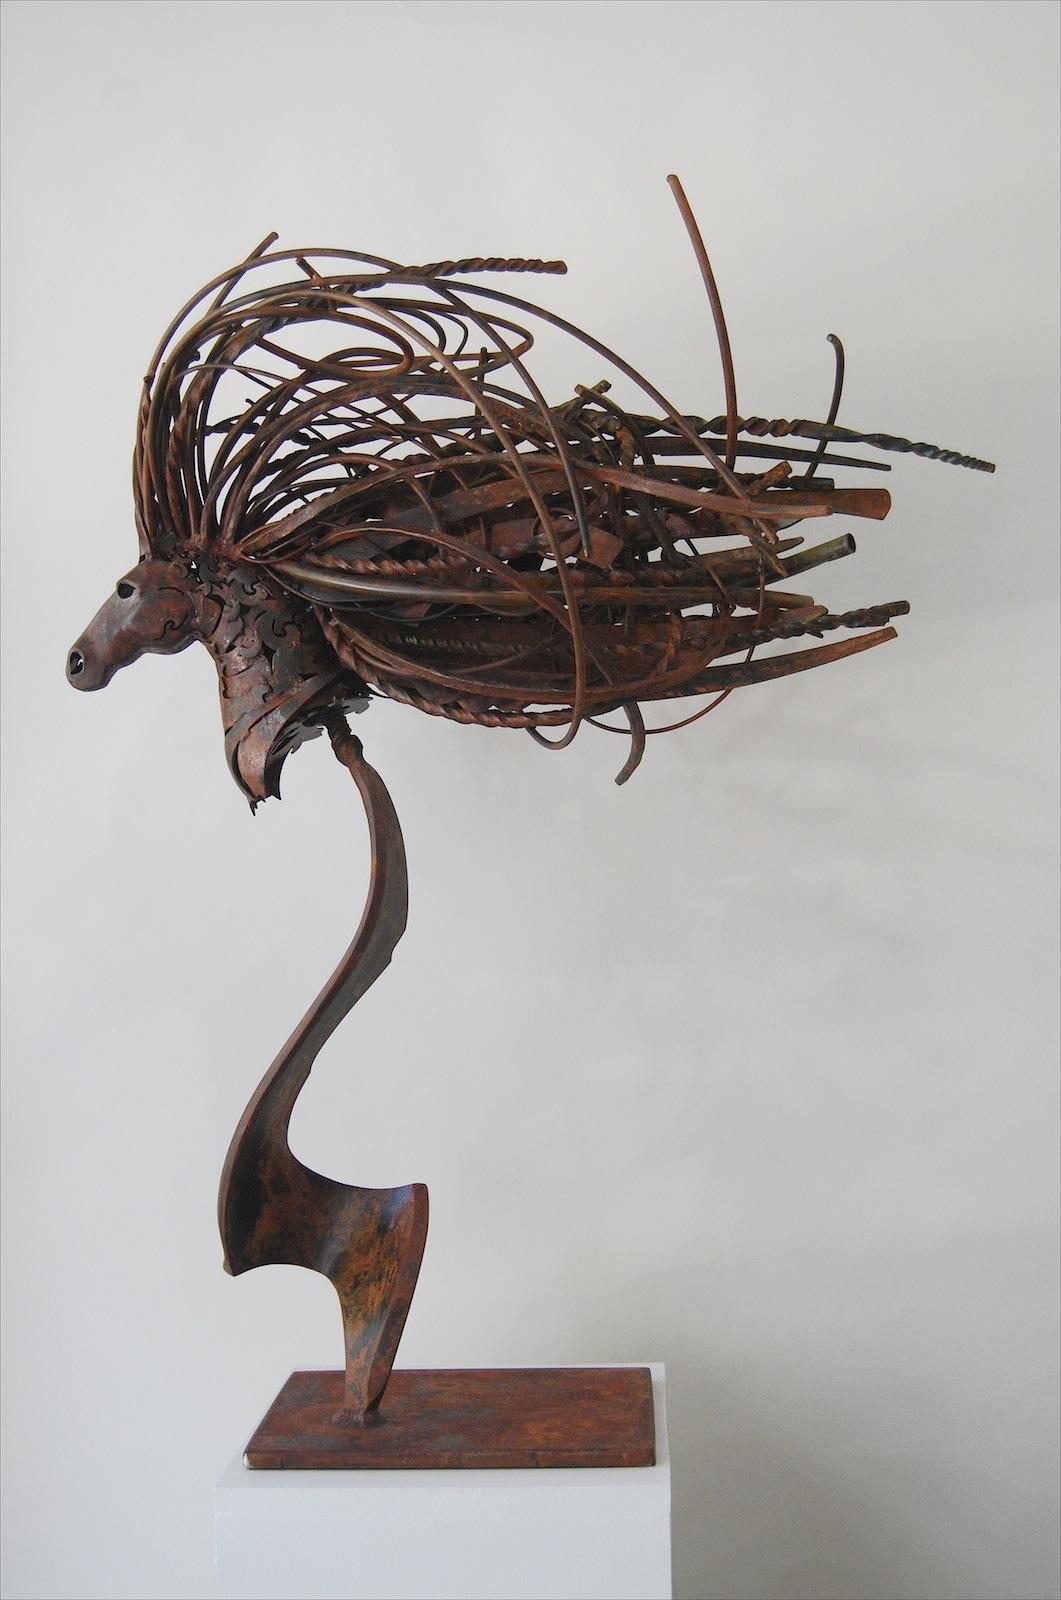 Sculpture Art Images